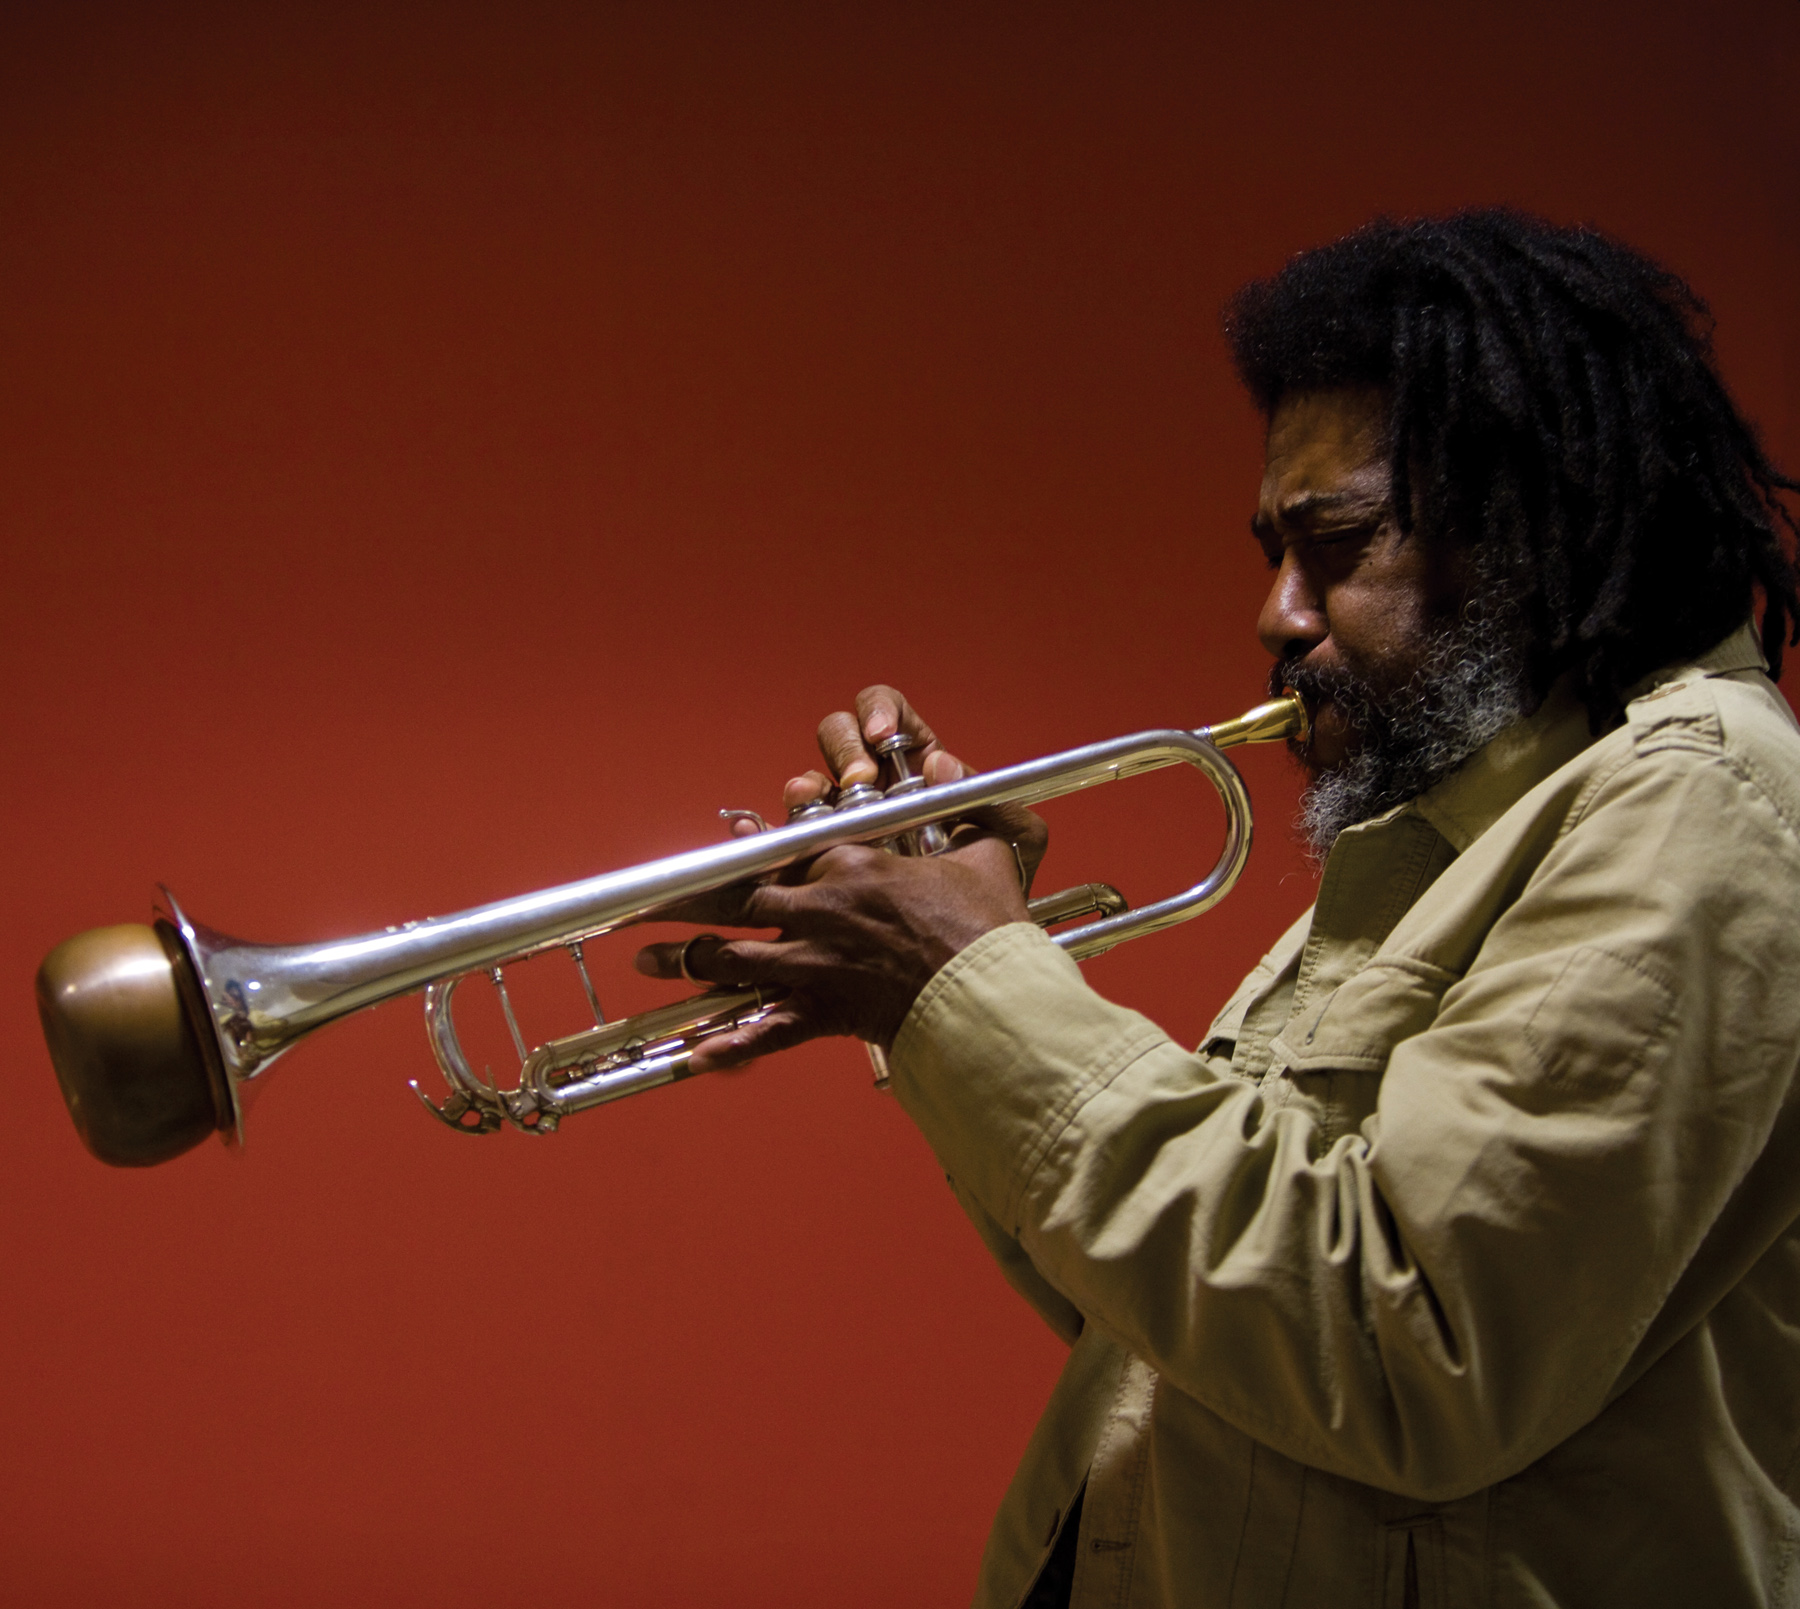 Wadada Leo Smith Leo Smith With The Bill Smith Ensemble - Rastafari